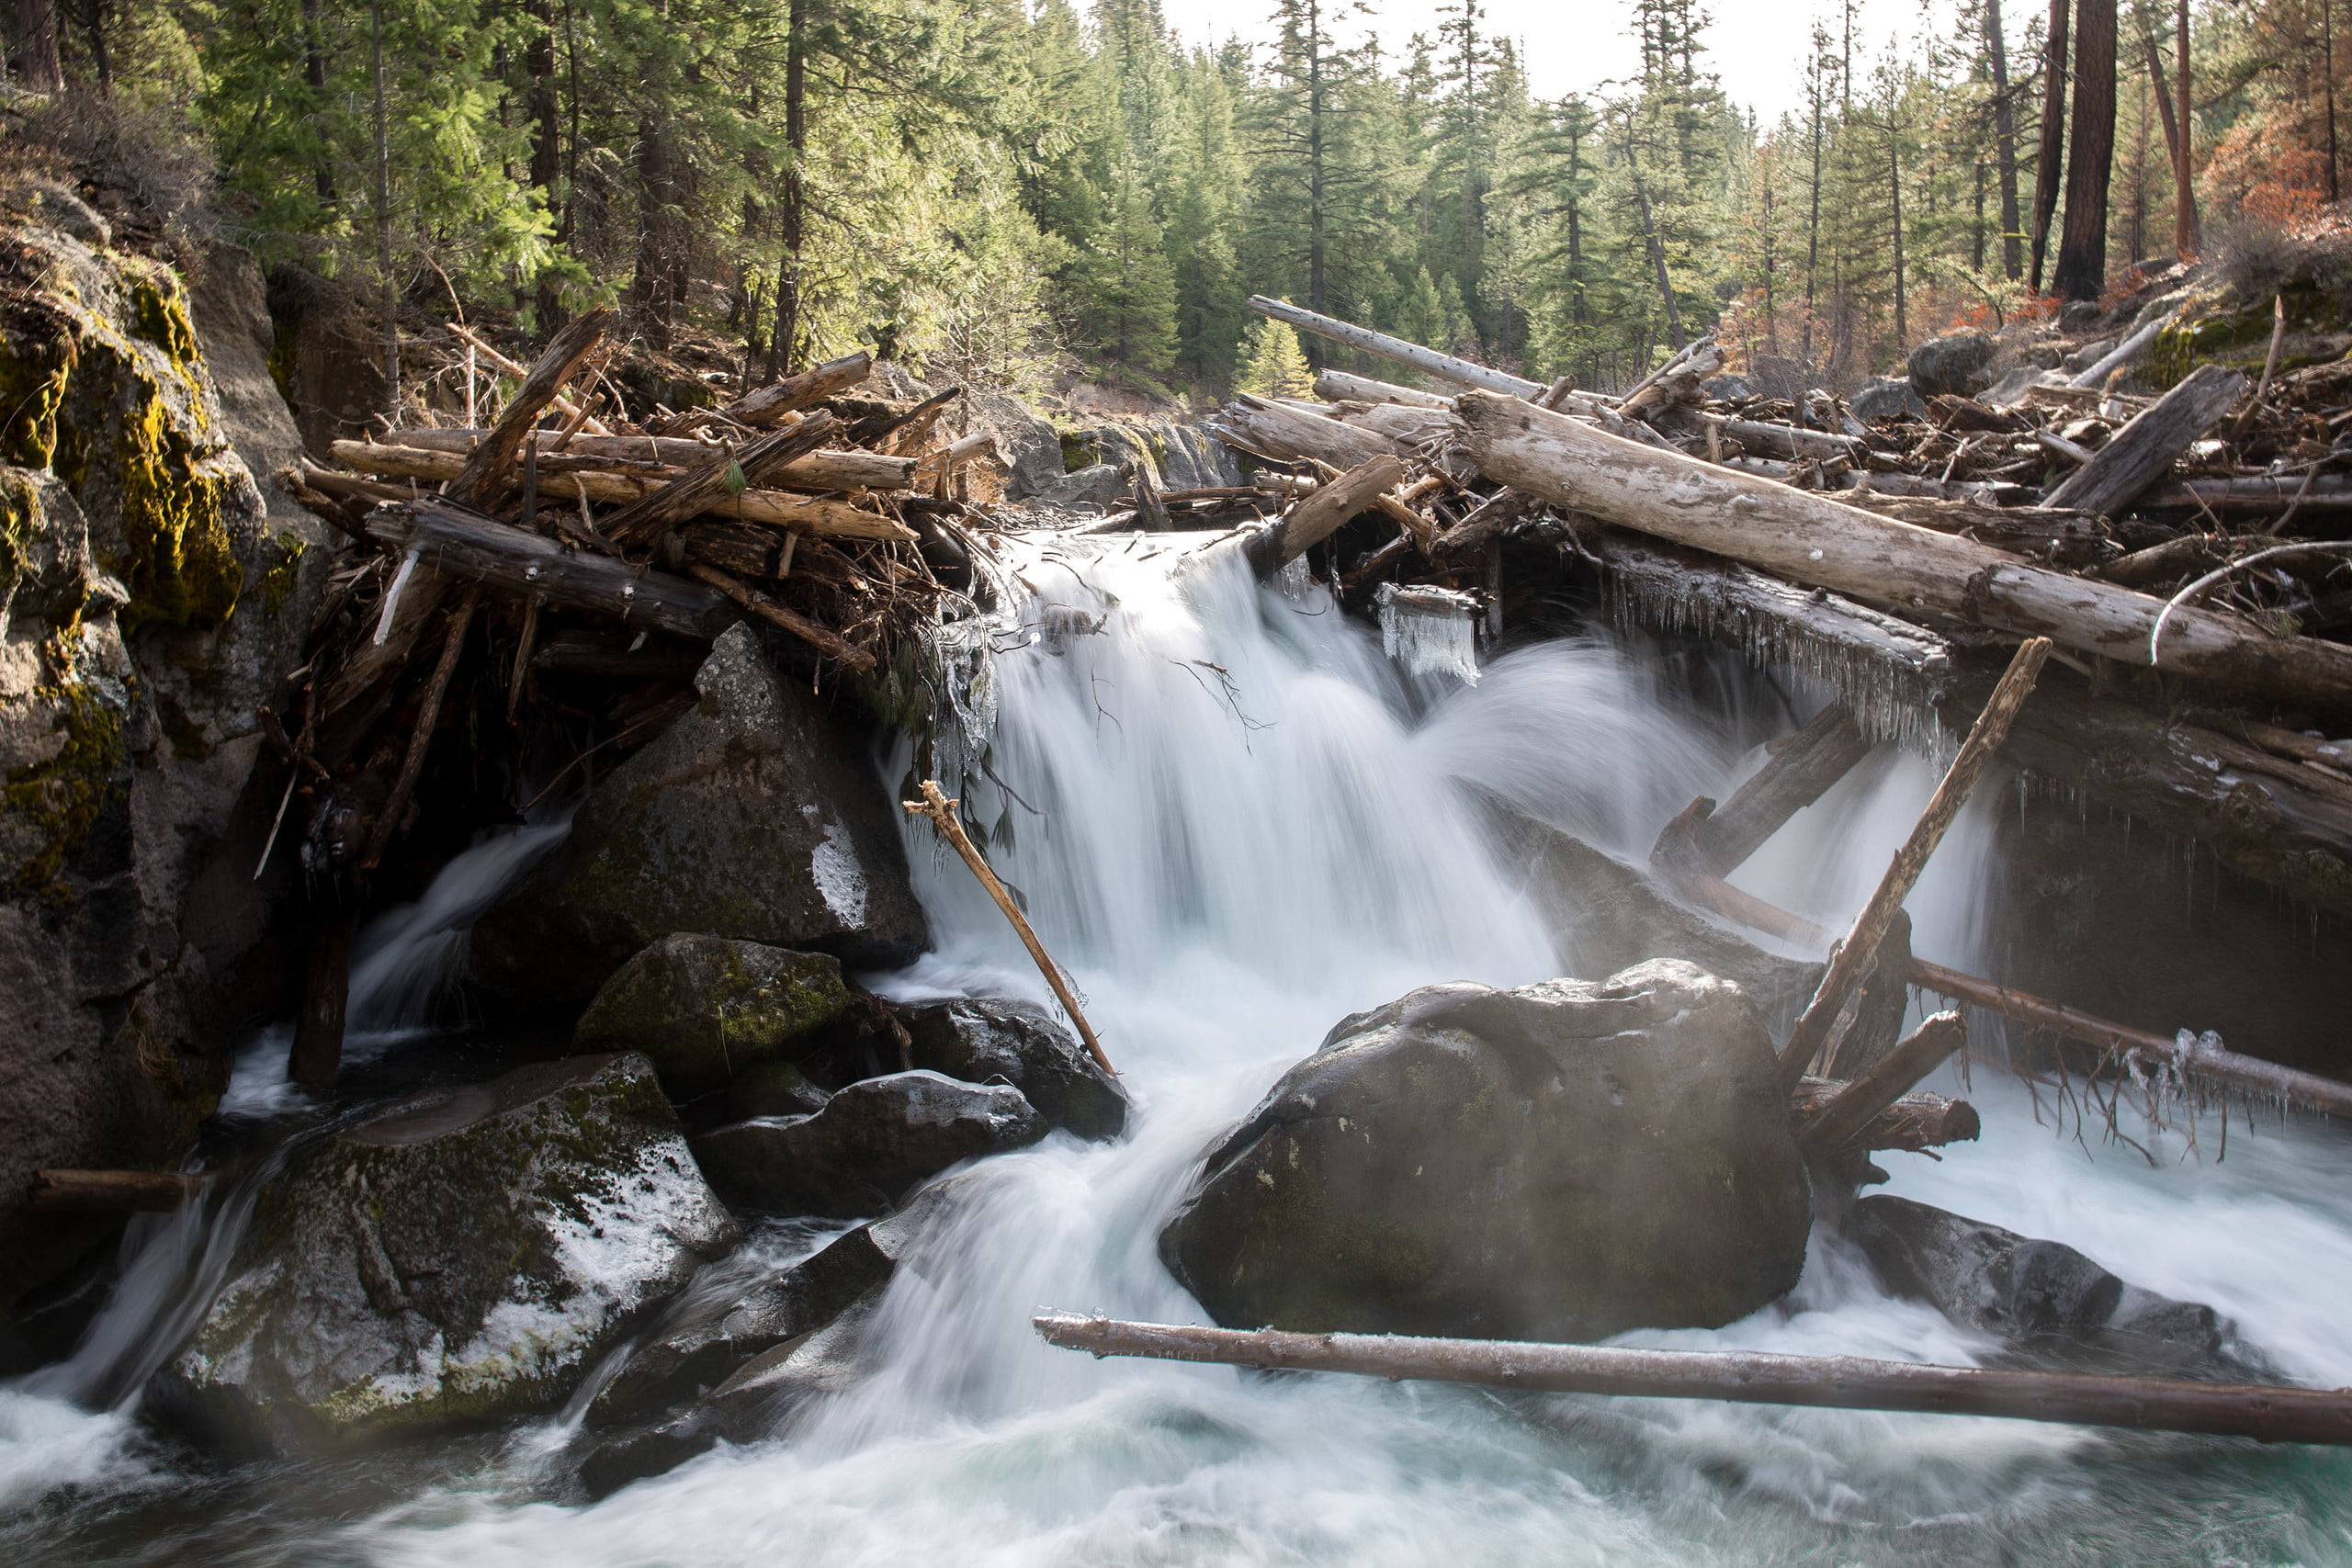 Whychus Creek - Trail 4070